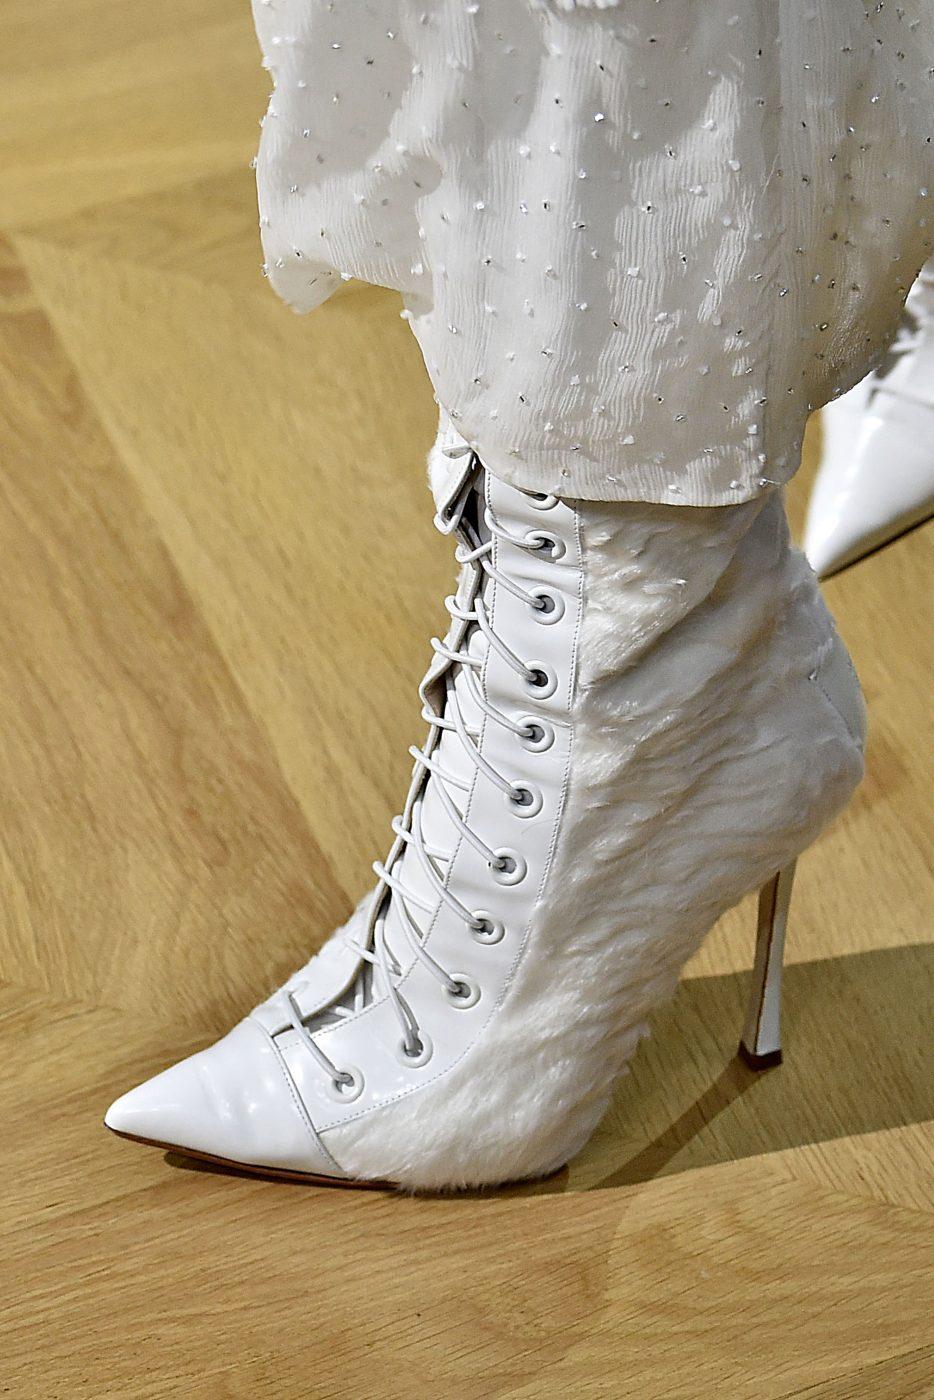 J Mendel Fur High Heel Shoes Haute Couture Fall Winter 2016